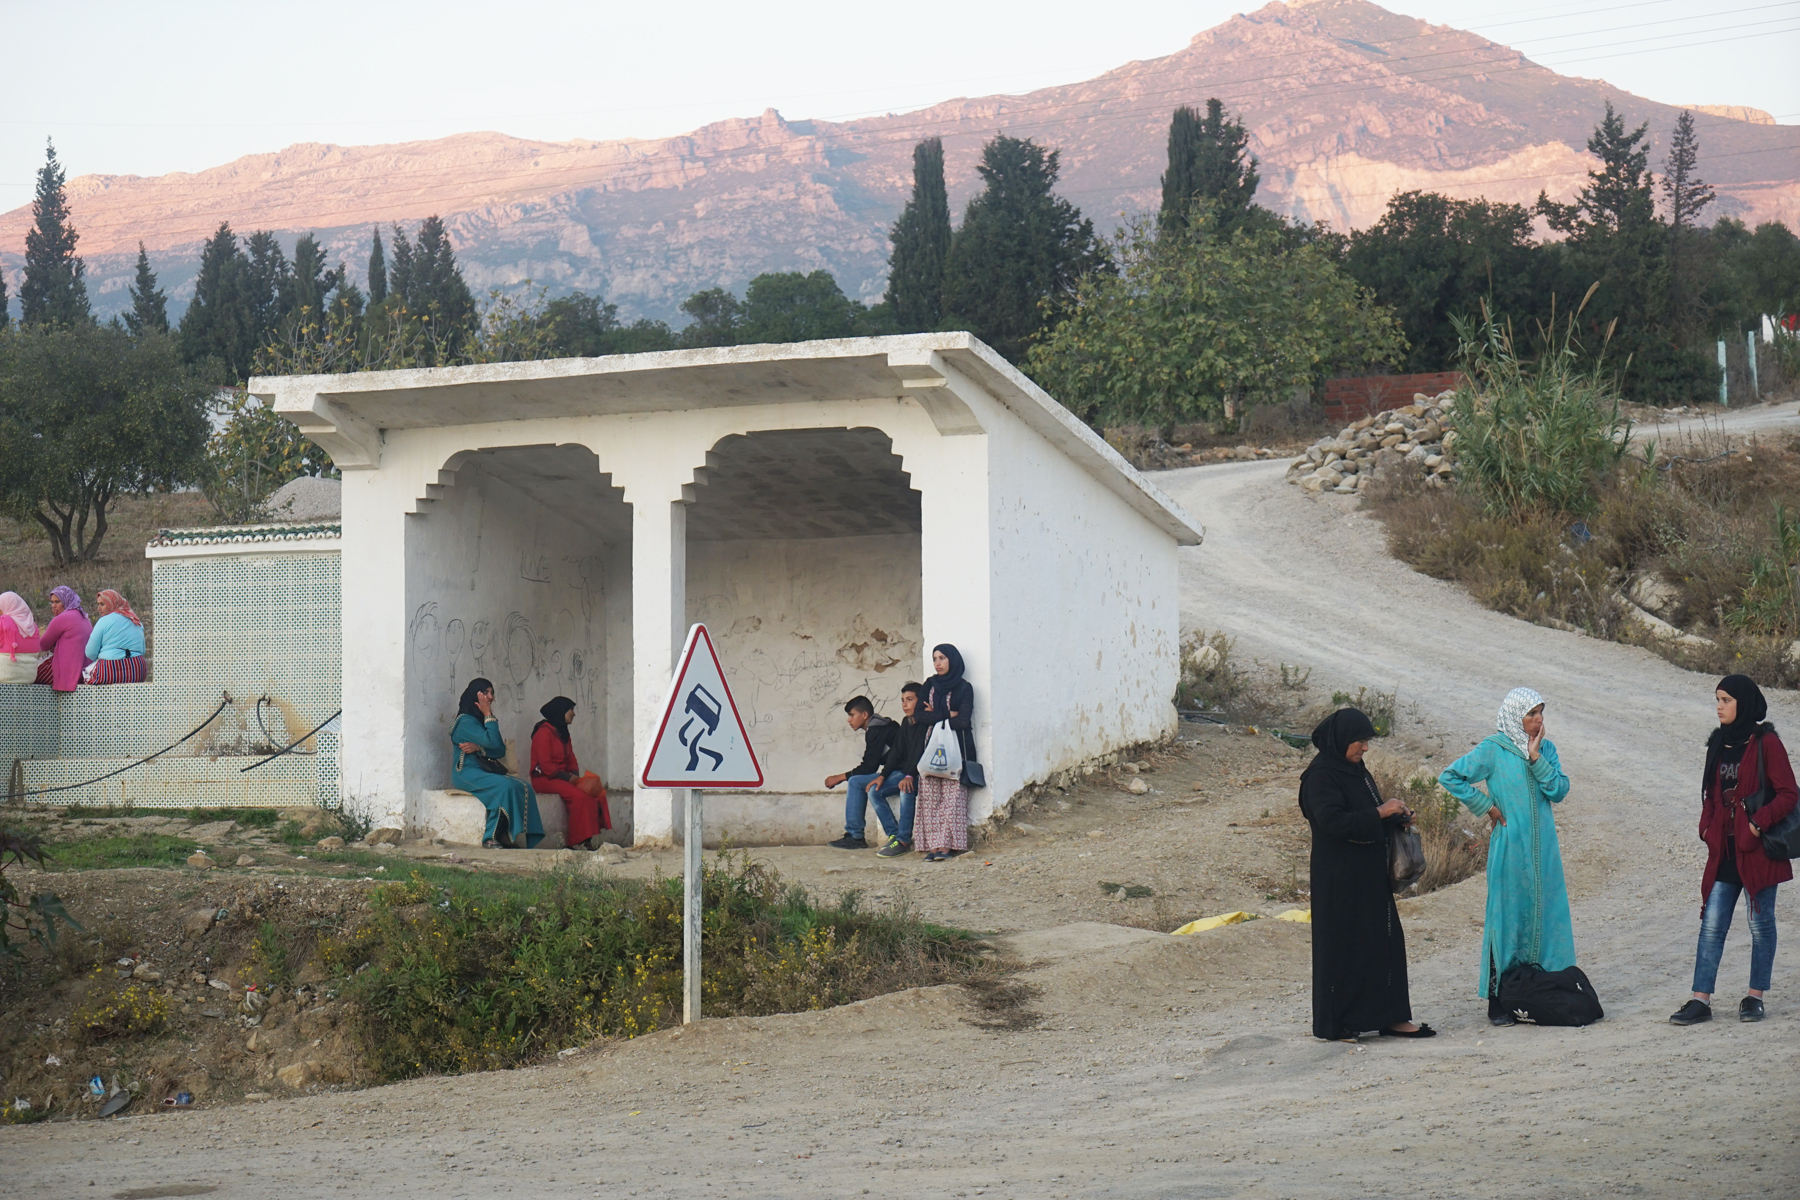 Bus Stop, Morocco